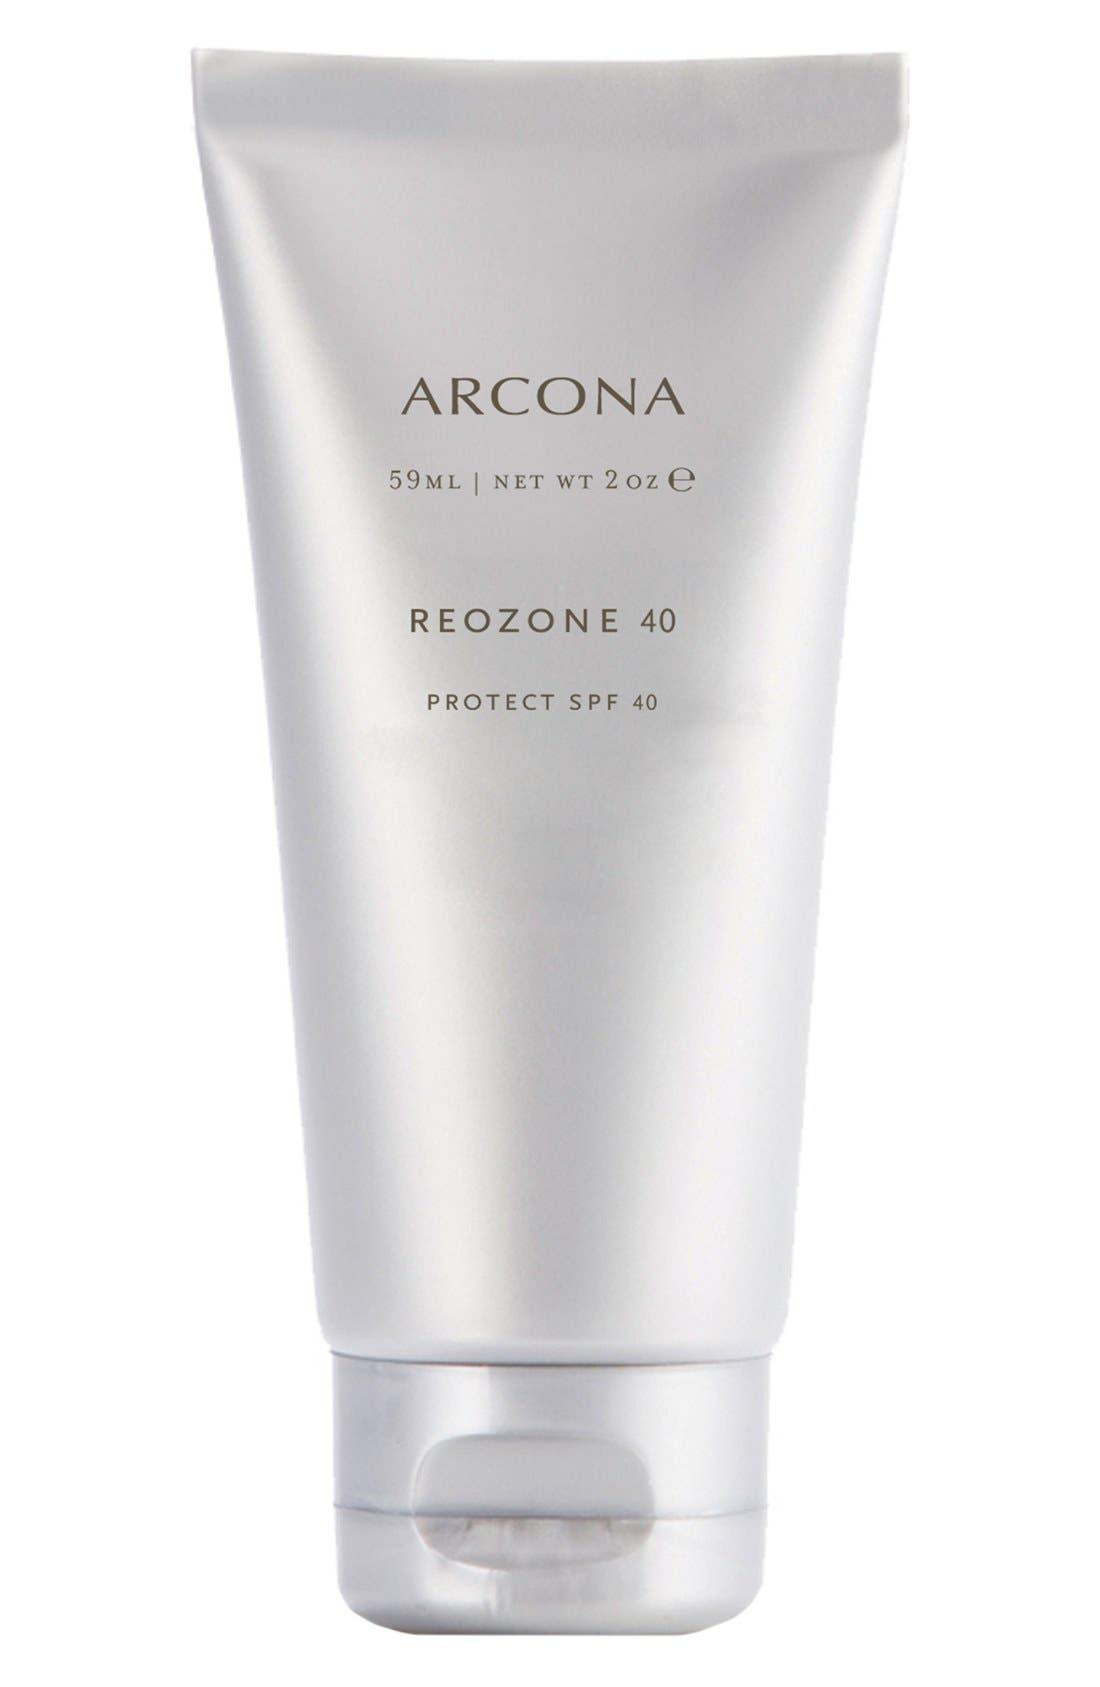 ARCONA Reozone 40 Sunscreen SPF 40, Main, color, NO COLOR